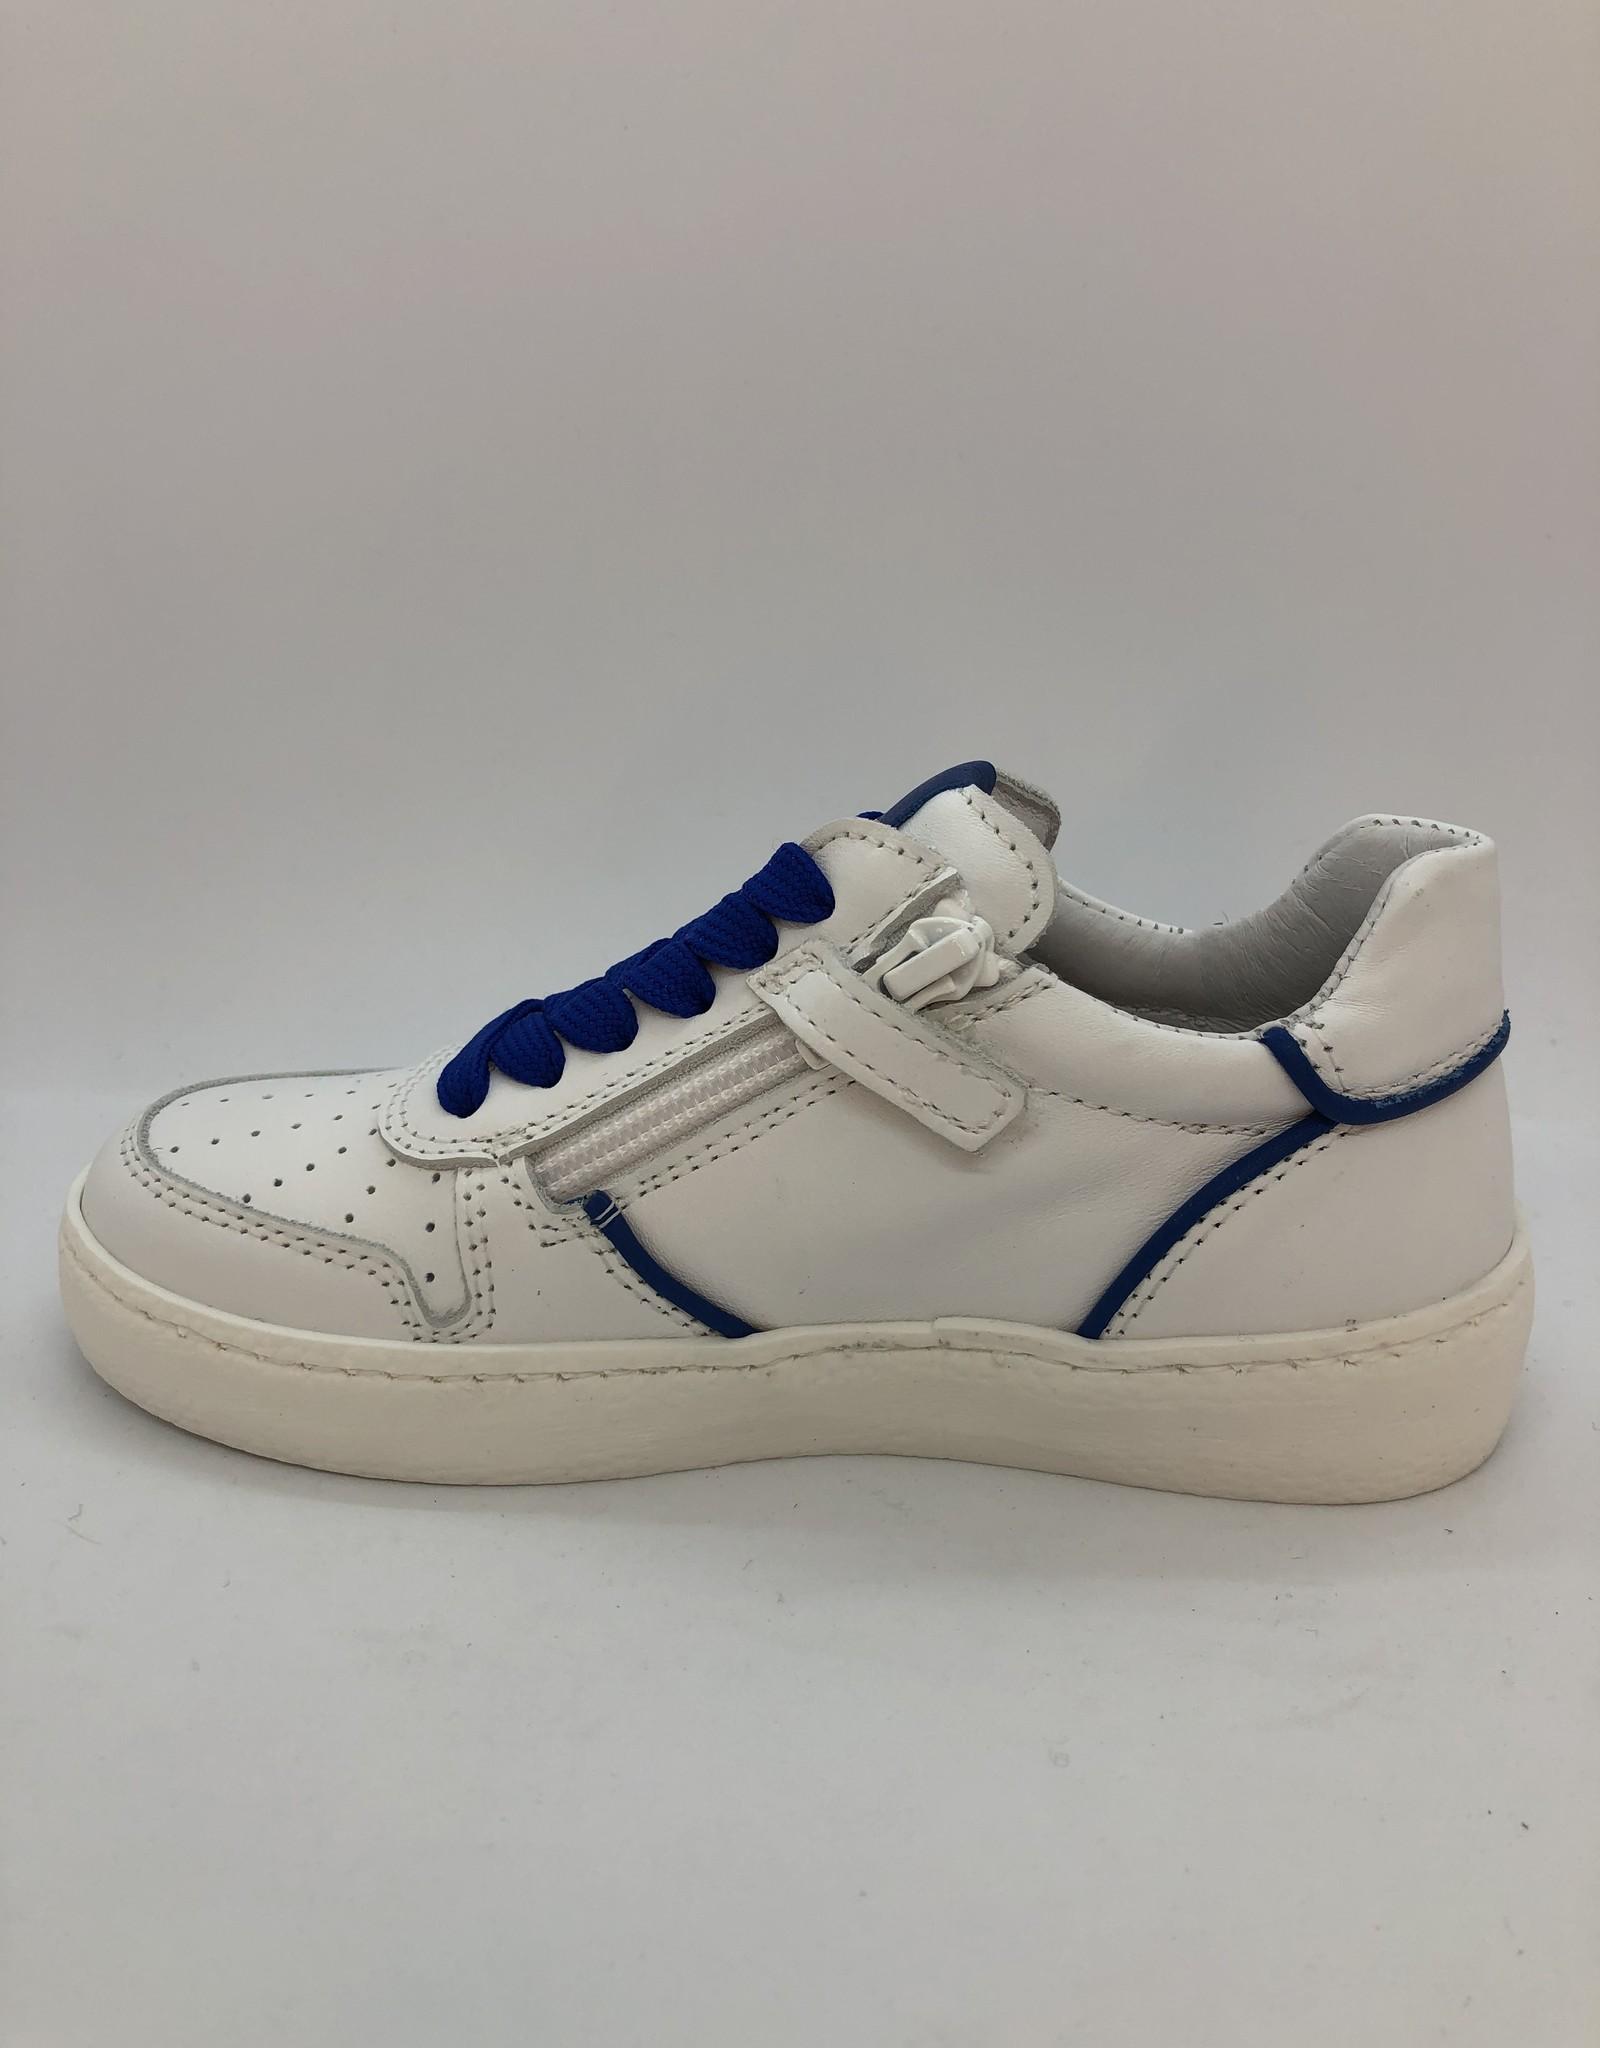 Lunella 21327 witte sneaker blauw accent